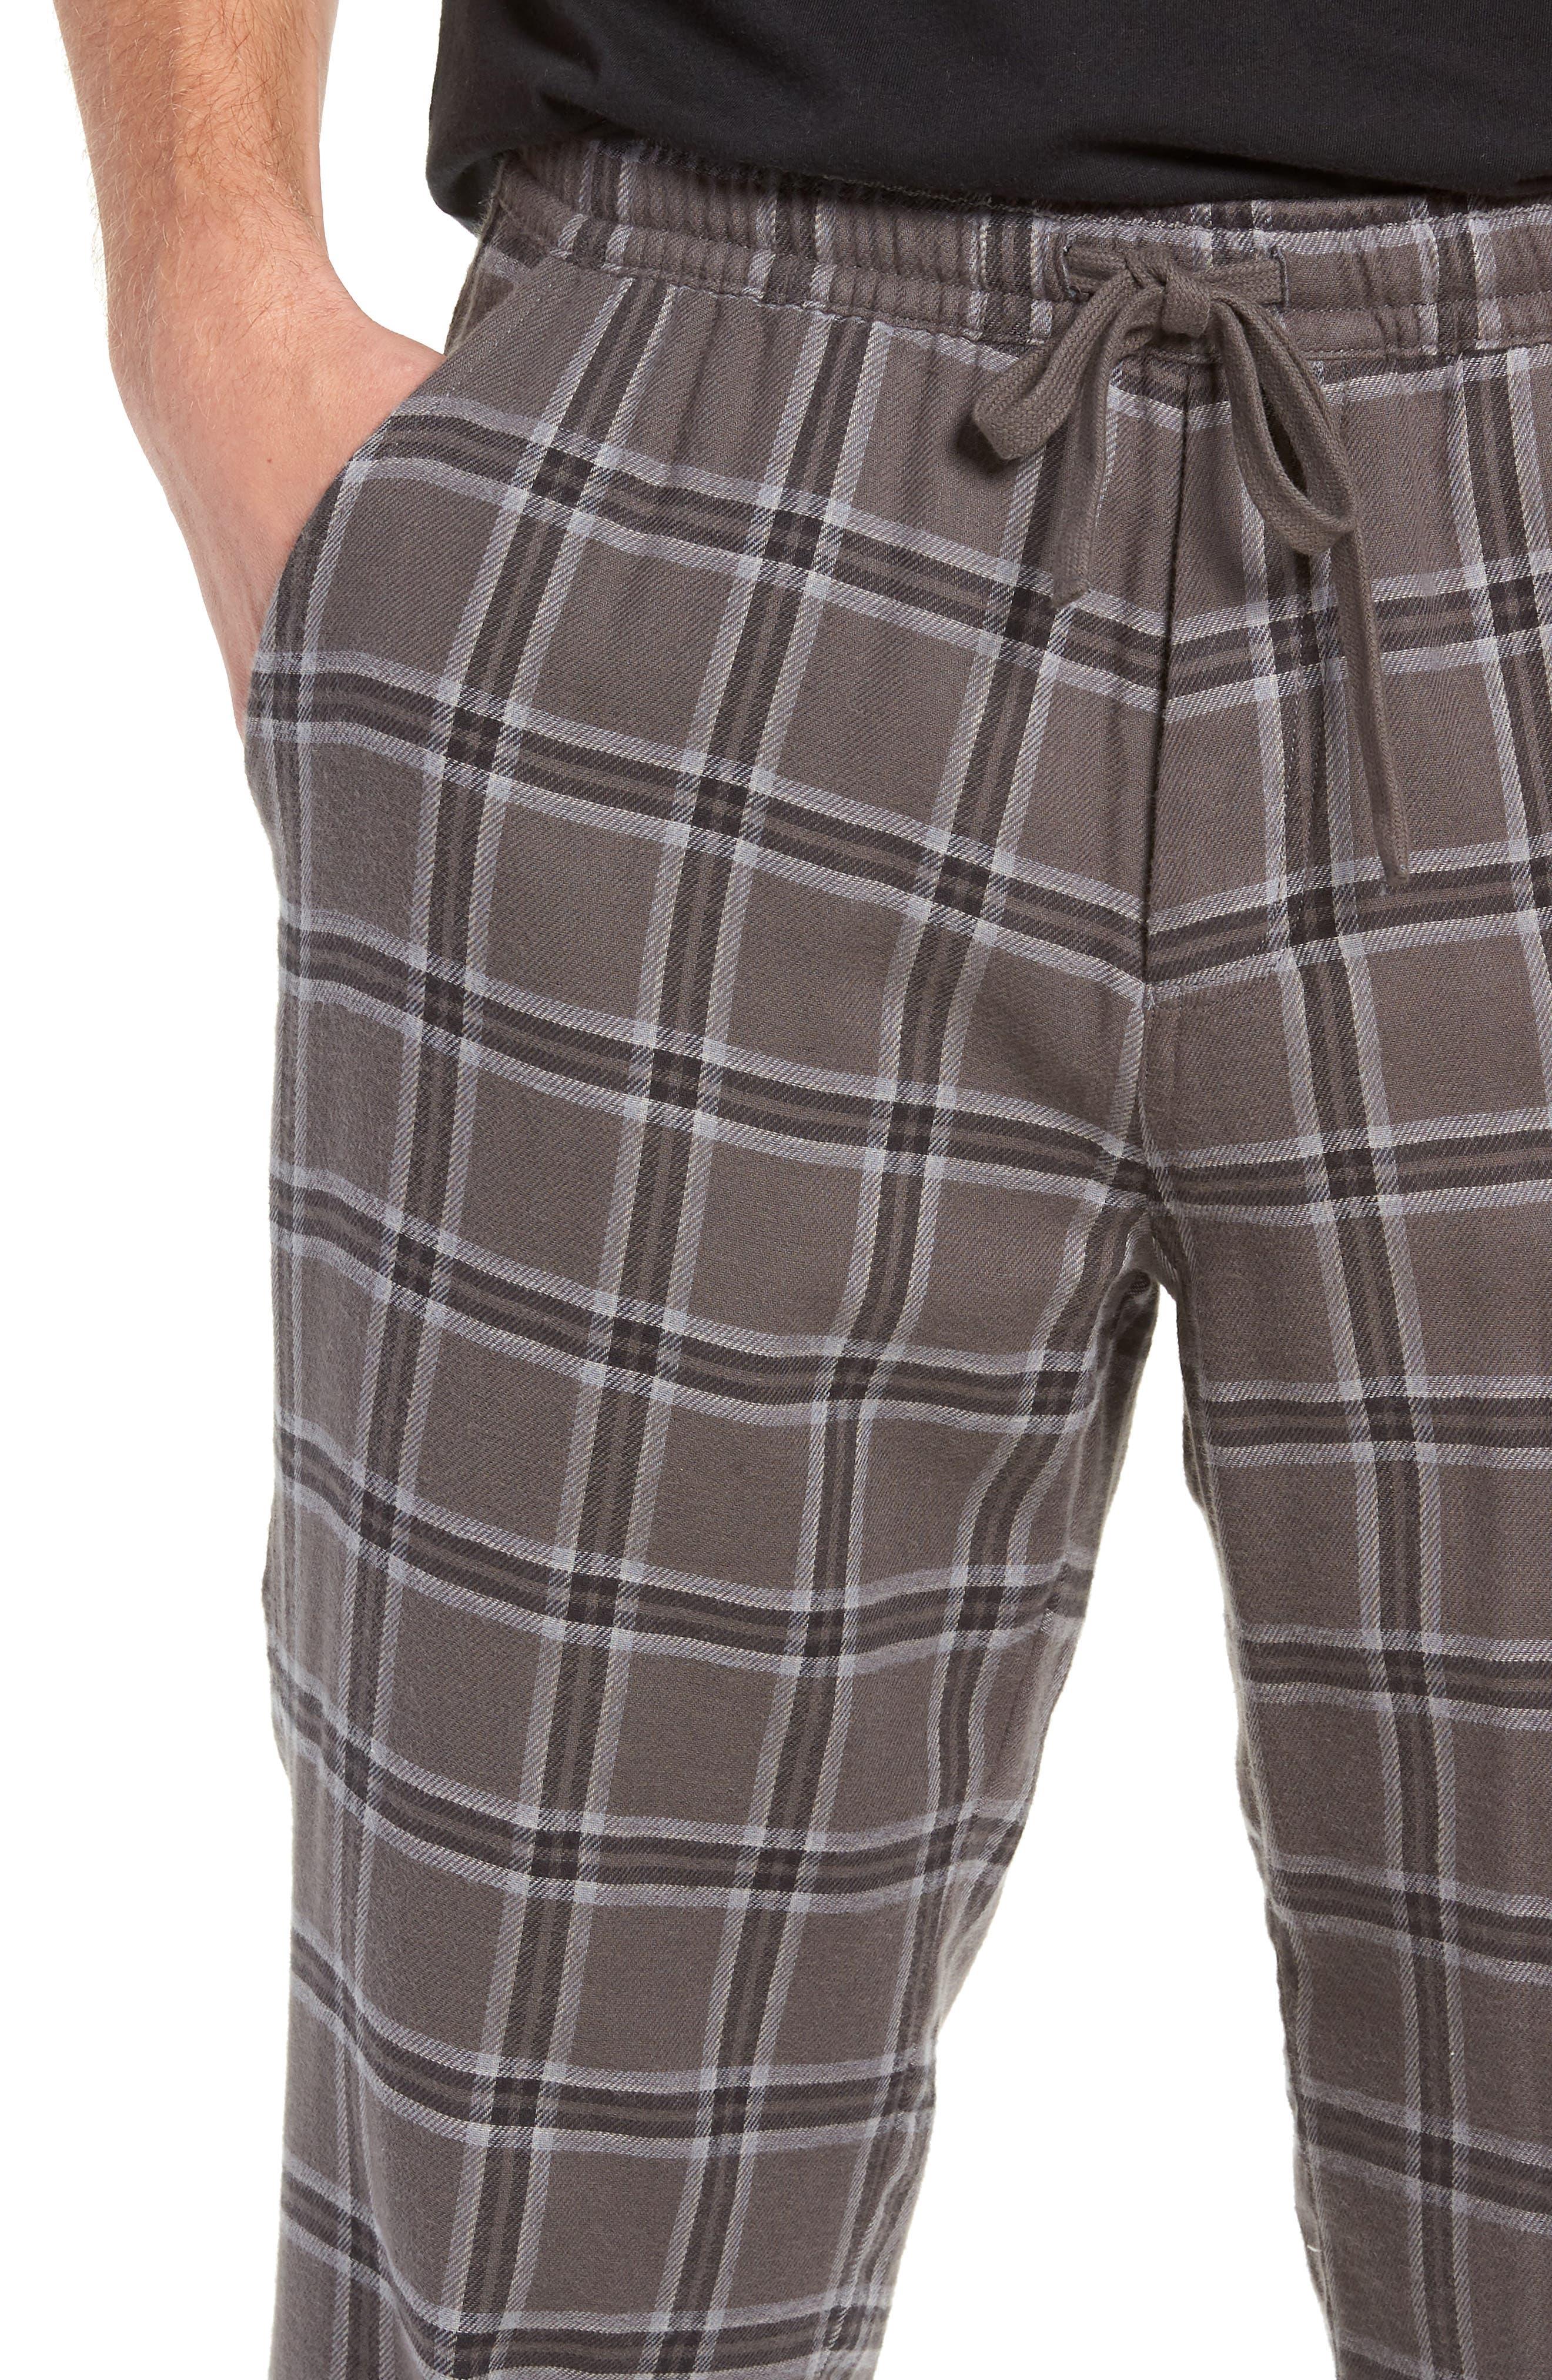 Grant Pajama Set,                             Alternate thumbnail 4, color,                             CHARCOAL/ BLACK